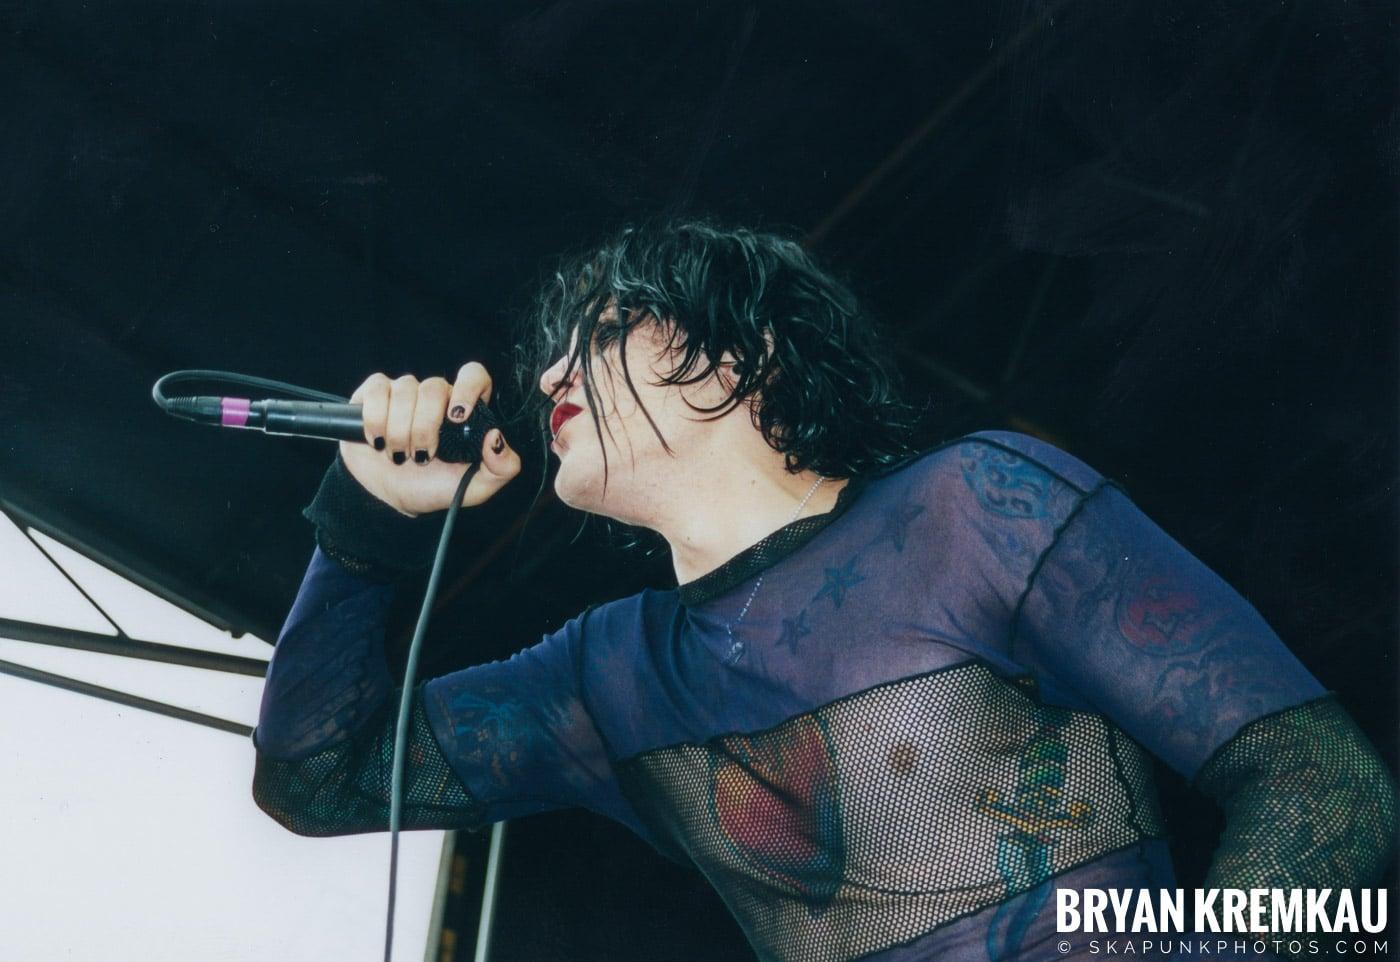 AFI @ Vans Warped Tour, Randall's Island, NYC - 8.4.01 (3)